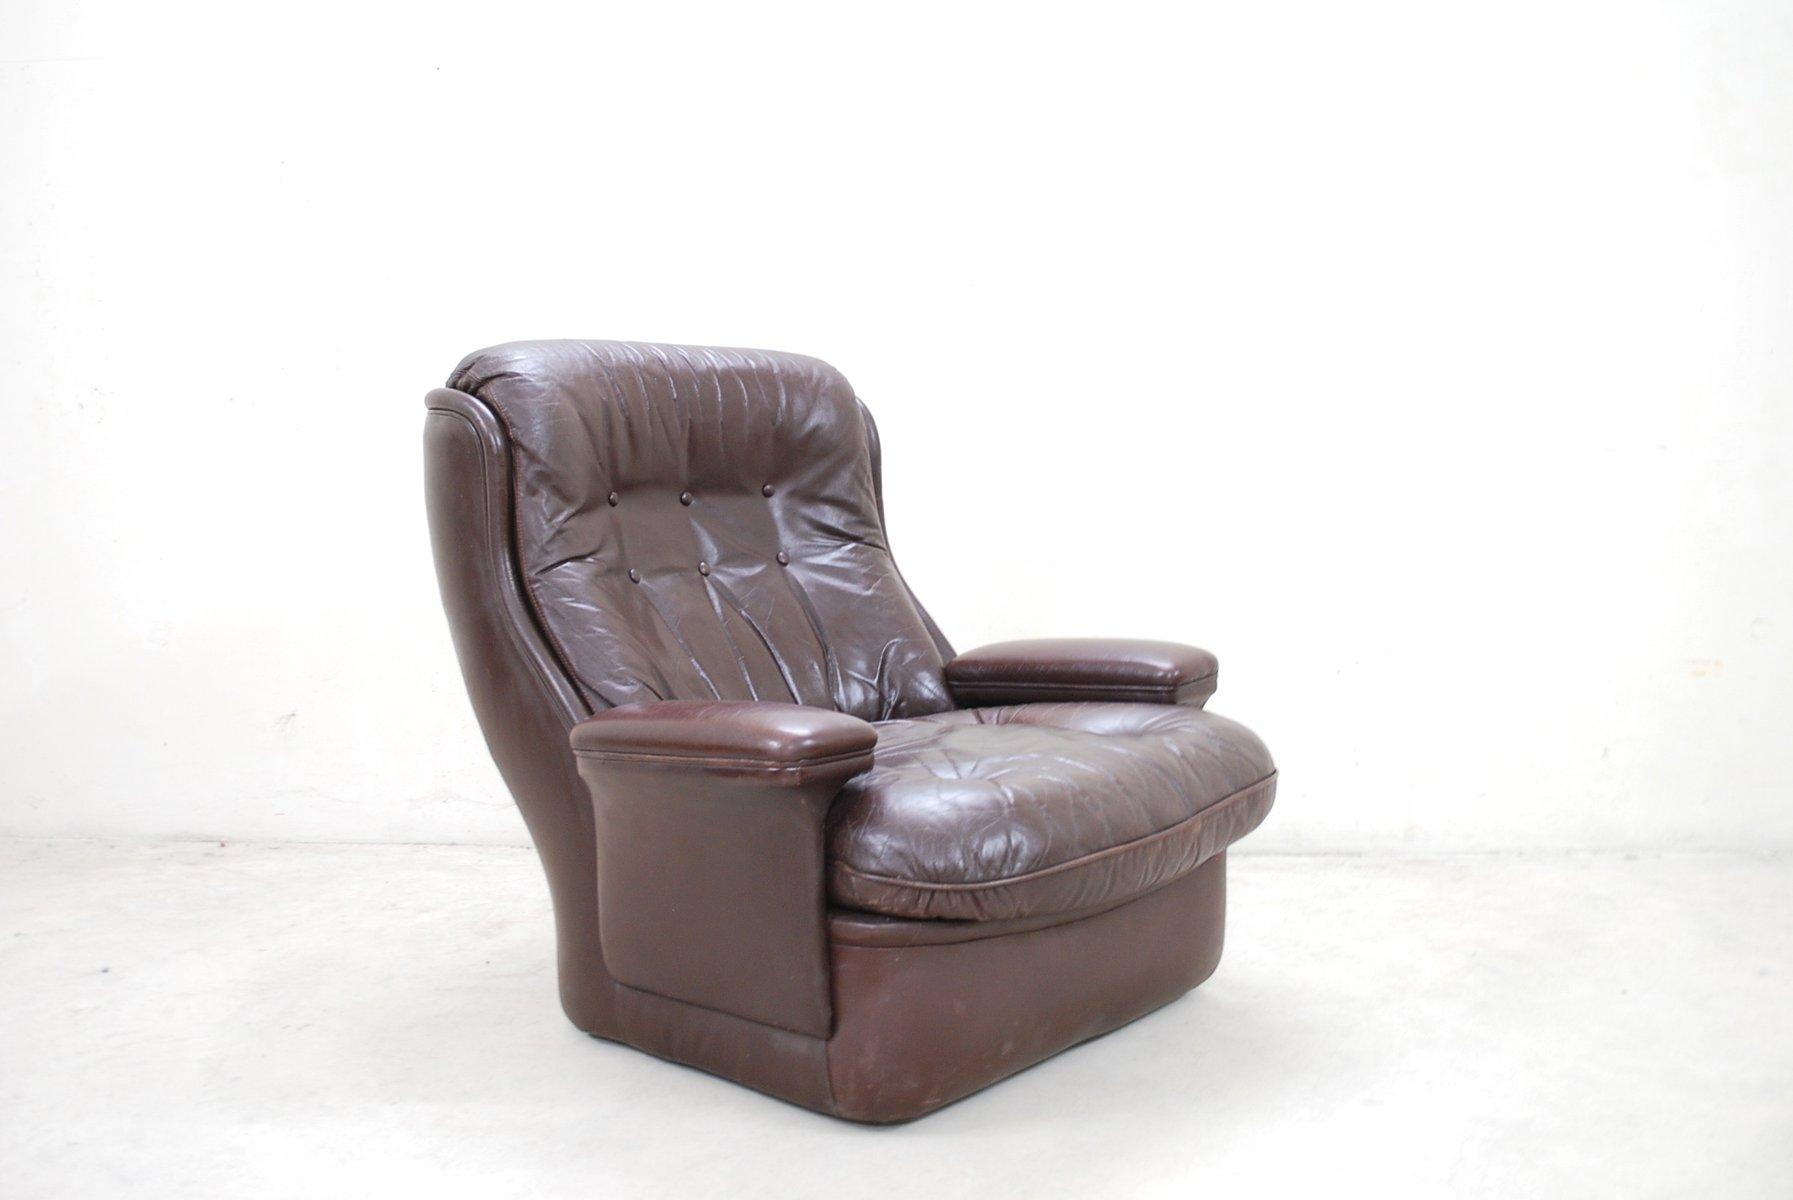 brauner vintage leder lounge stuhl und ottoman von. Black Bedroom Furniture Sets. Home Design Ideas